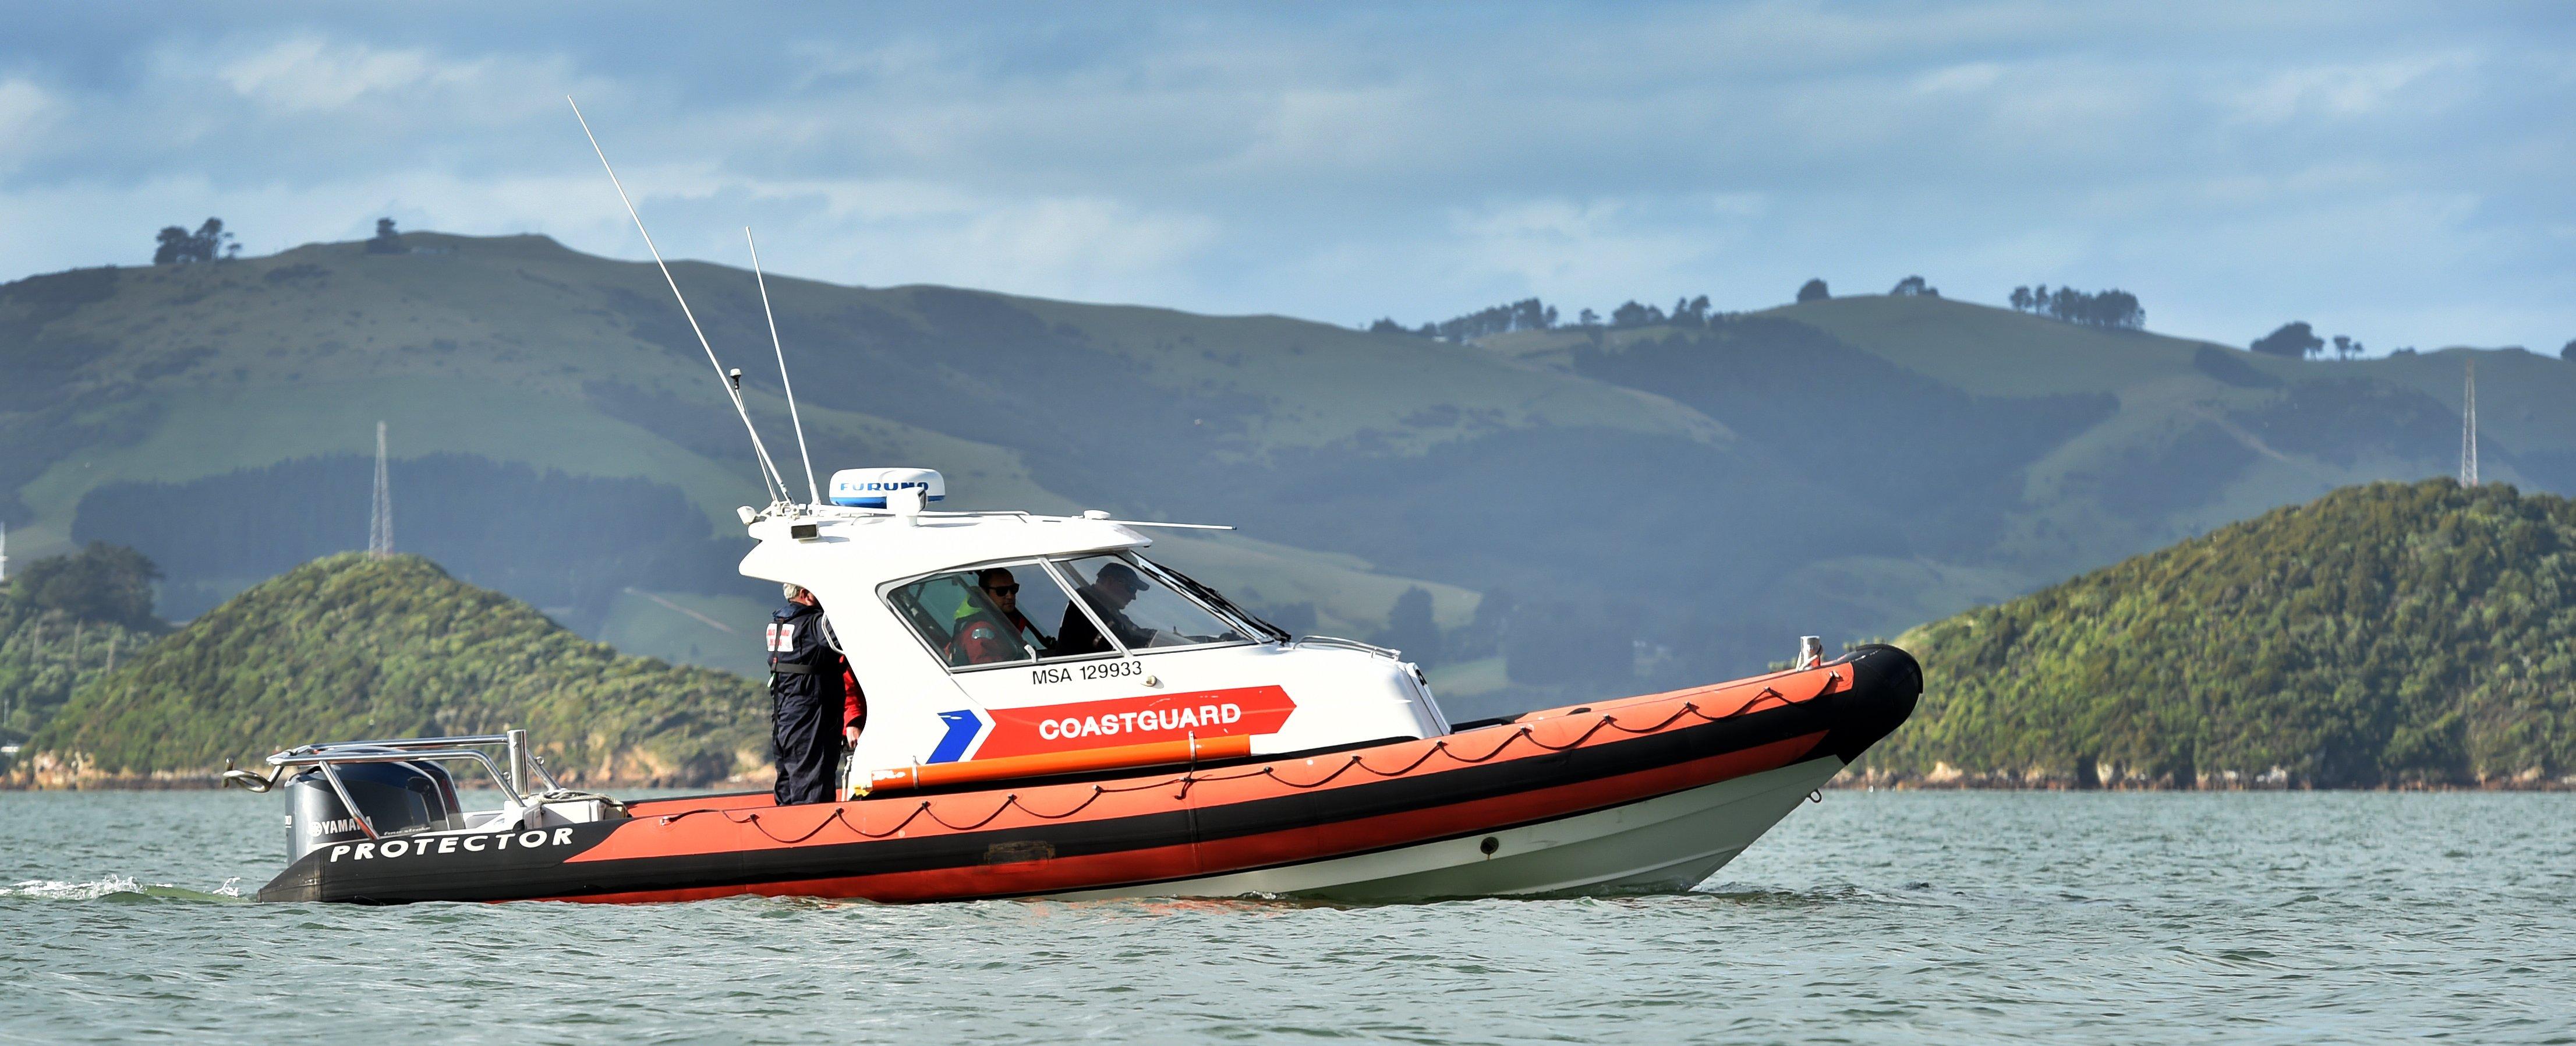 Coastguard Dunedin boat Dunedin Rescue at Broad Bay on Otago Harbour.